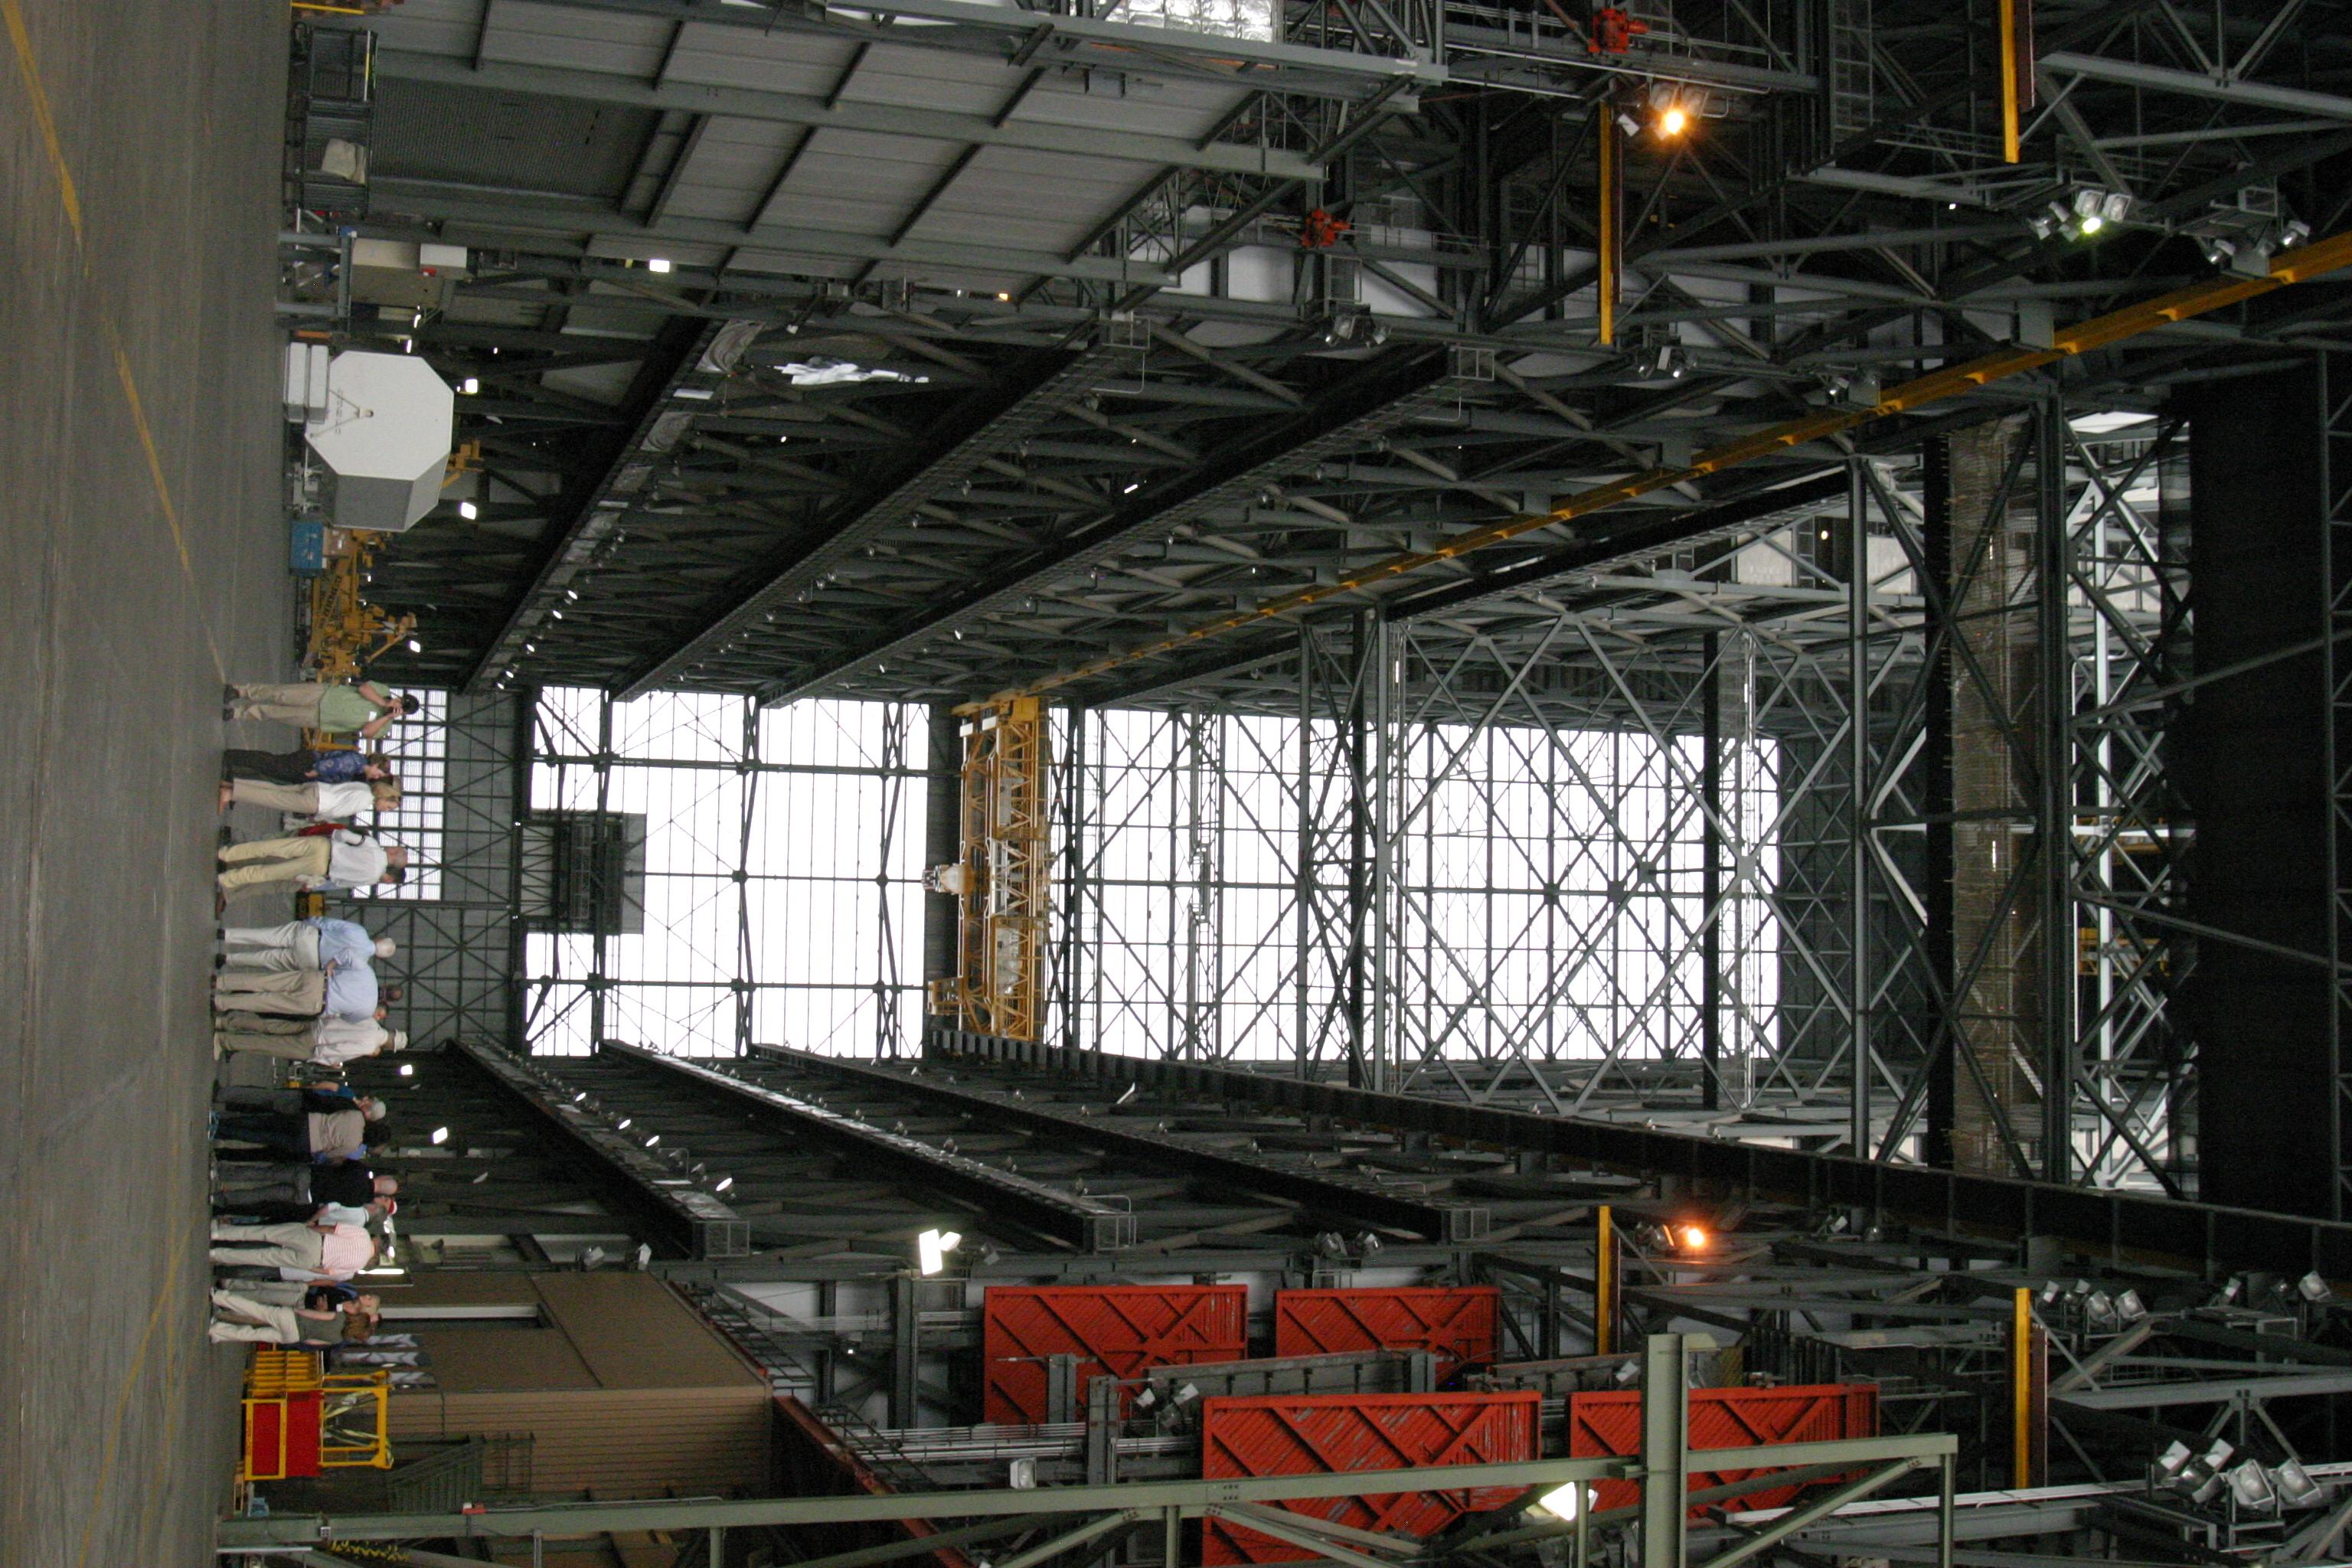 nasa vehicle assembly building interior - photo #12